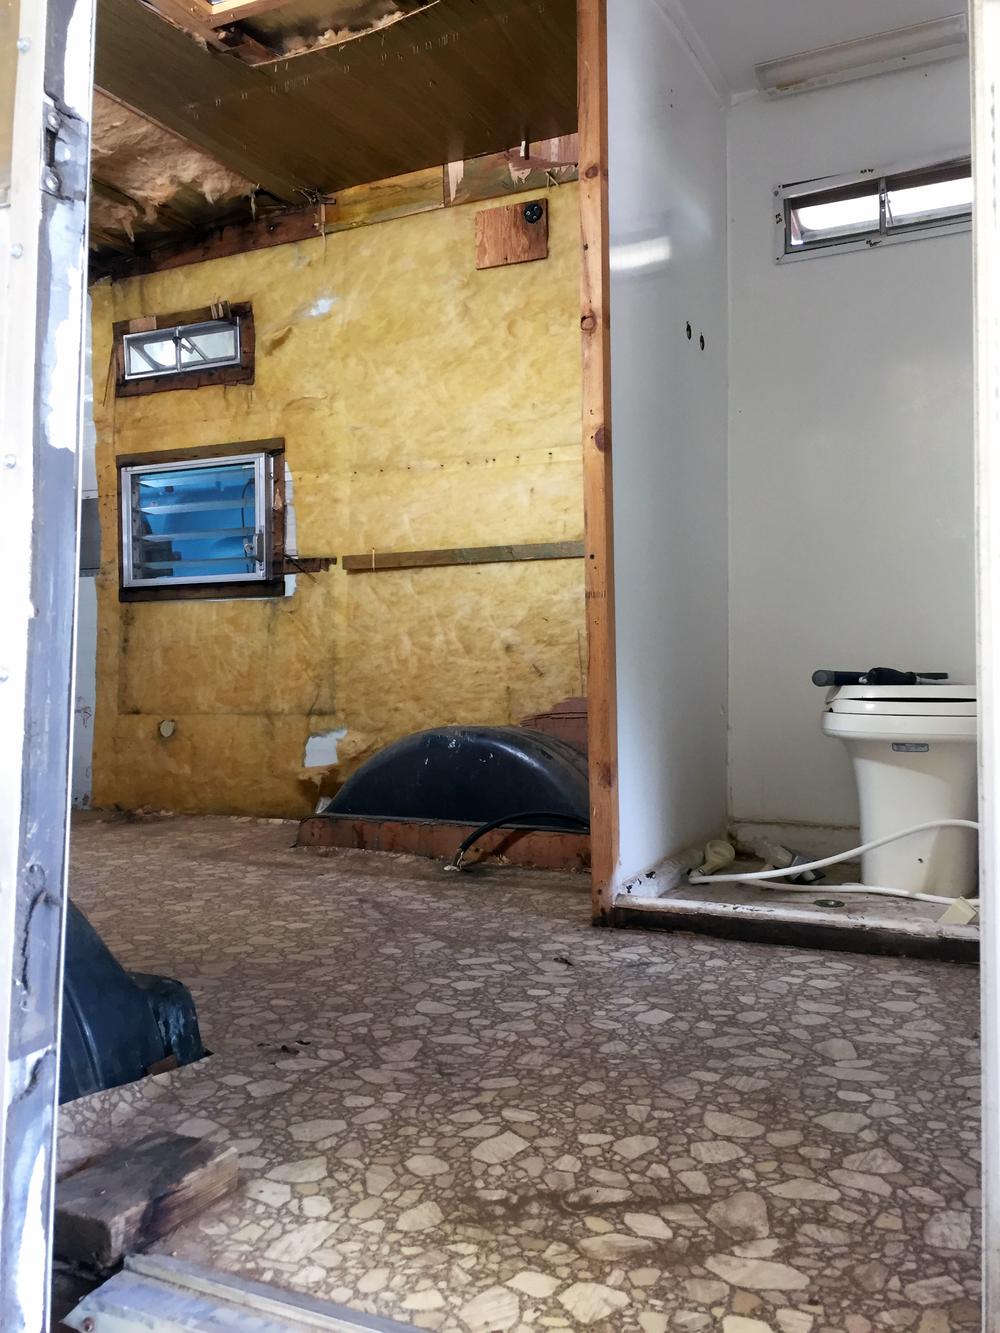 End of demo day 2 —storage closets/bathroom area